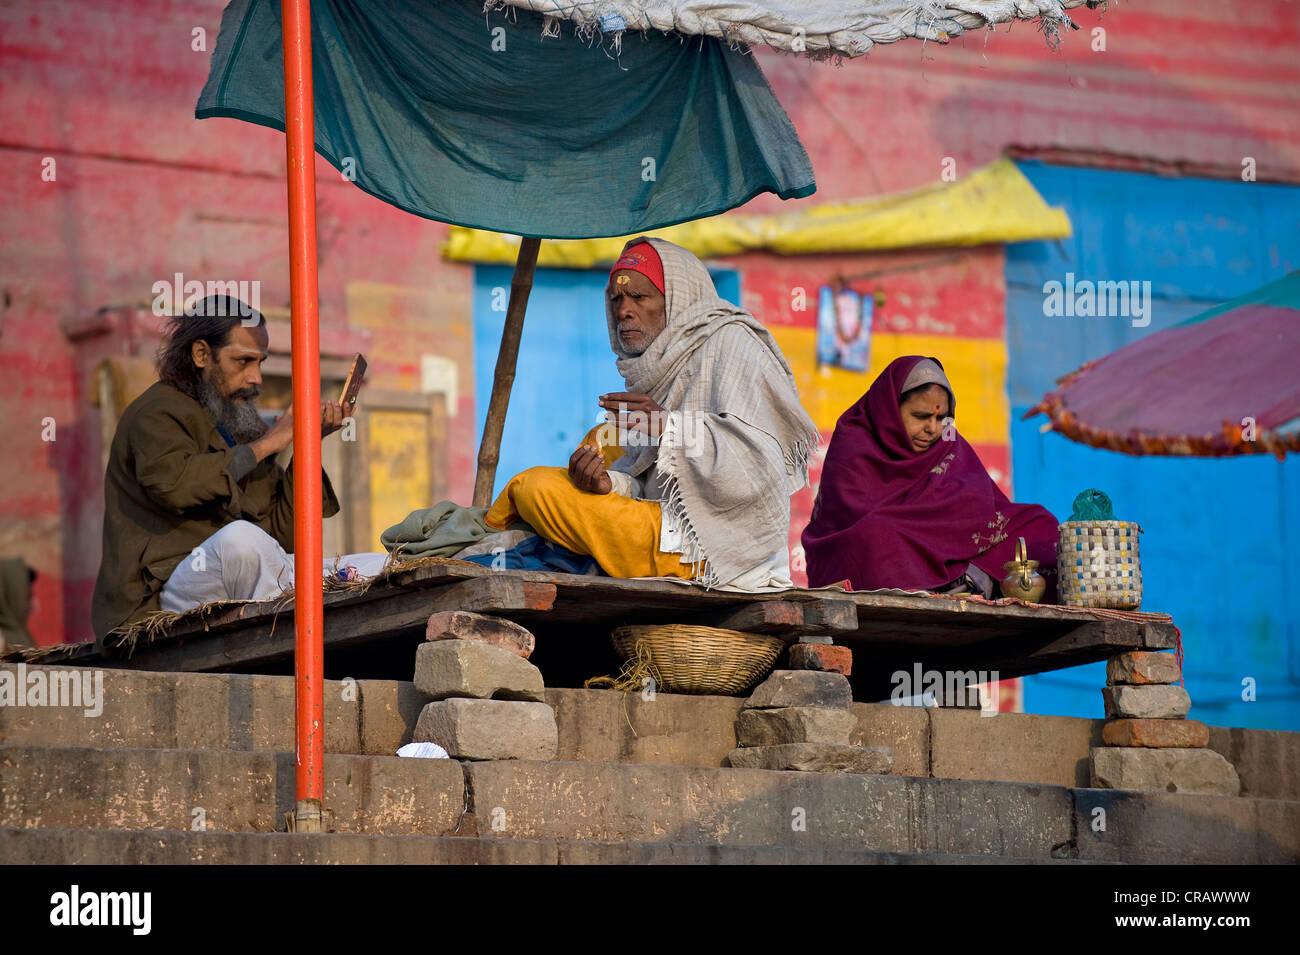 Les hommes à les Ghats ou Saint escalier, Gange, Varanasi, Uttar Pradesh, Inde, Asie Photo Stock